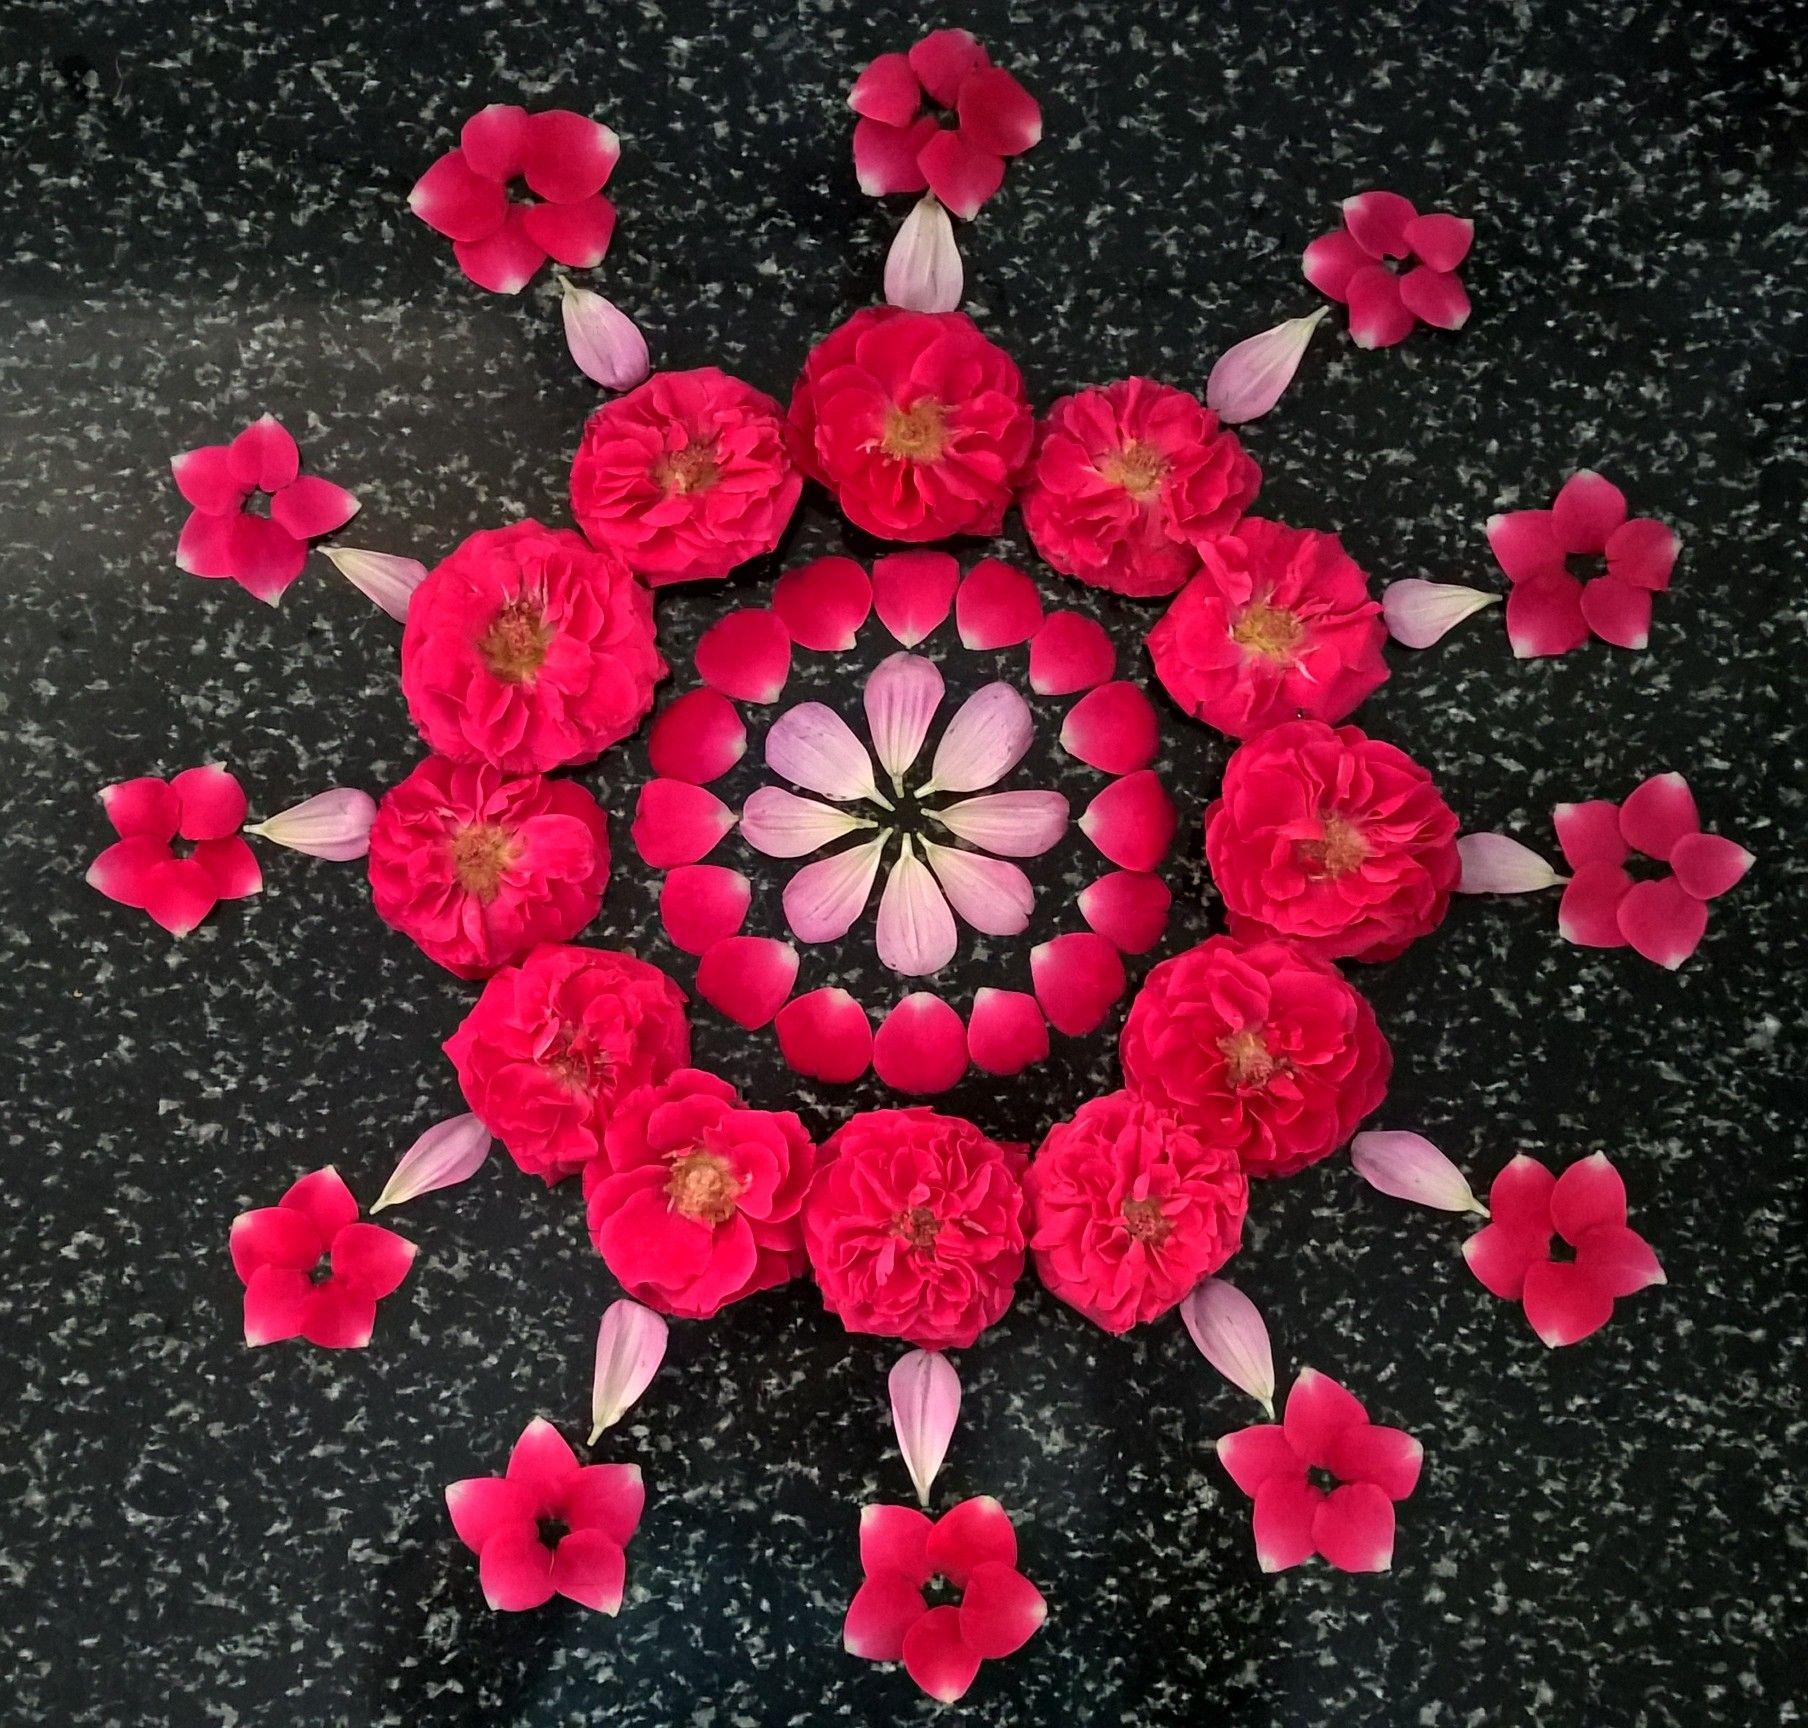 Red rose 🌹 arrangements.. Flower arrangement designs